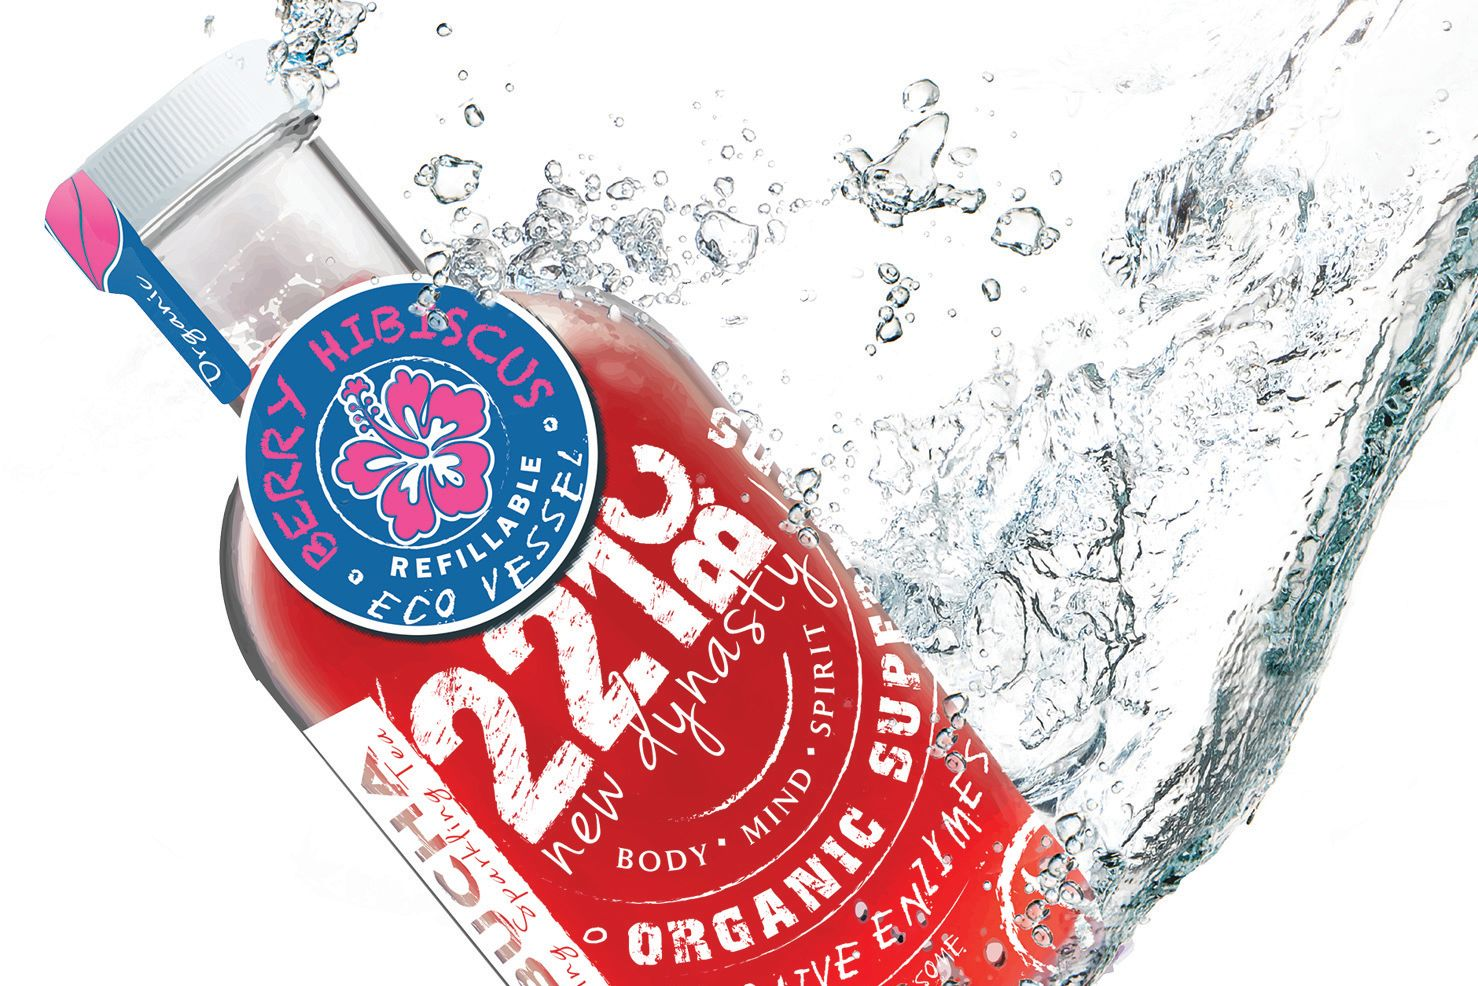 Kombucha 221bc bottle splash 15x15 hrvqlp